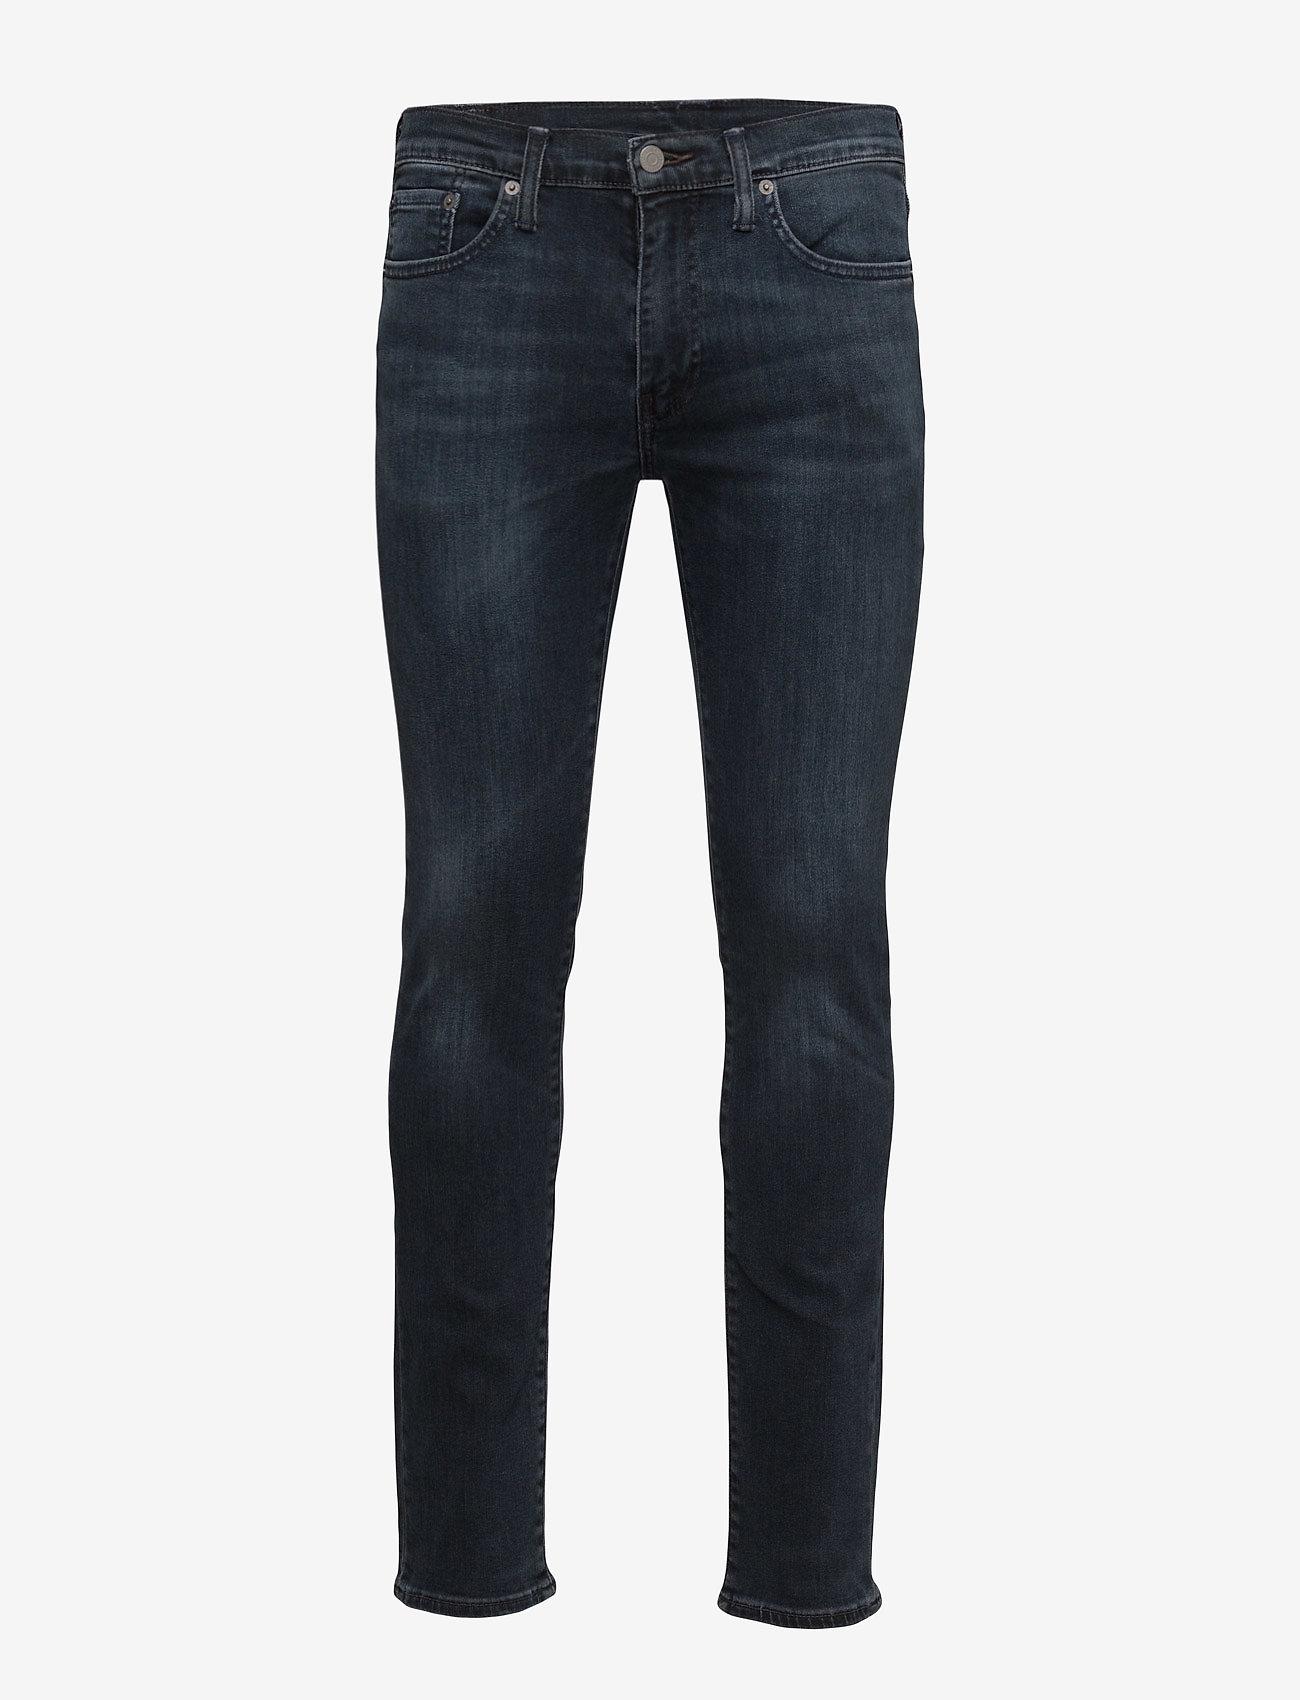 LEVI´S Men - 511 SLIM FIT HEADED SOUTH - džinsa bikses ar tievām starām - dark indigo - worn in - 1